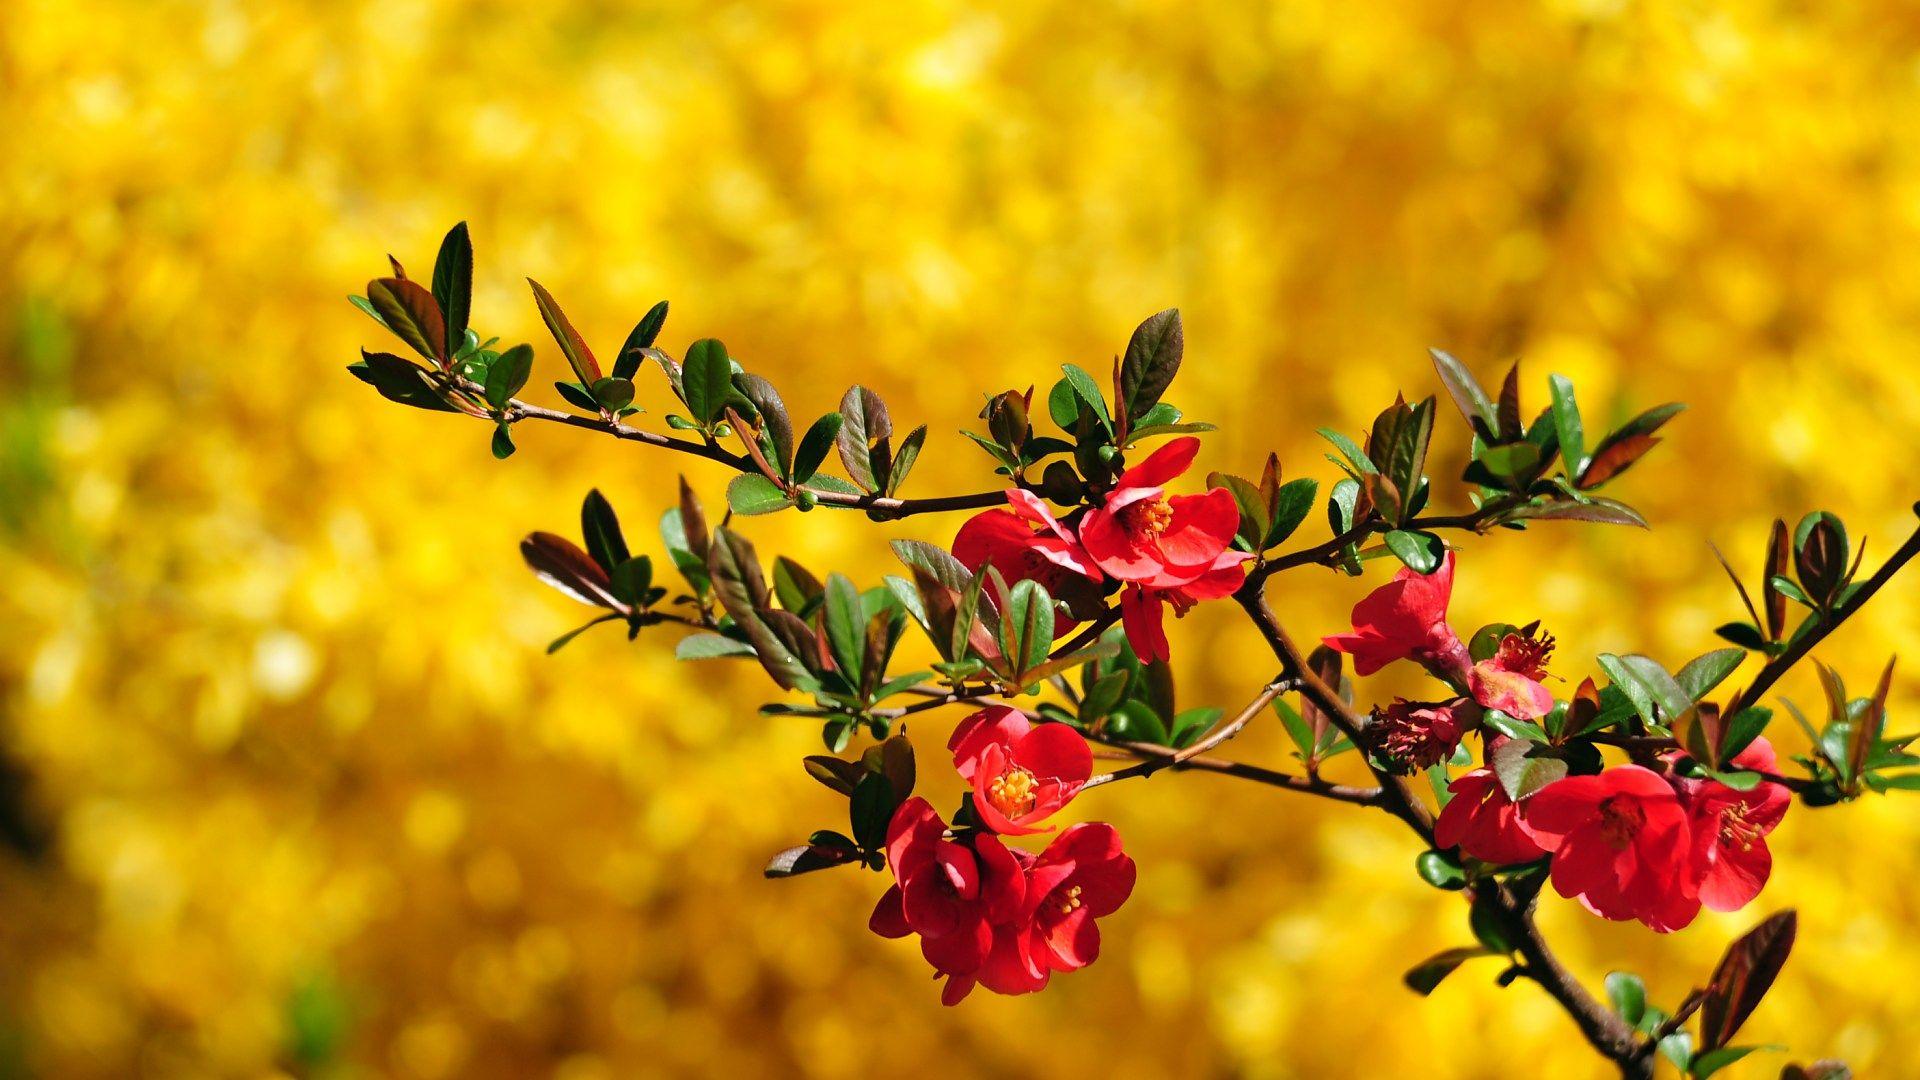 HD Spring Flowers Wallpaper Animal Desktop Pictures 1920x1080